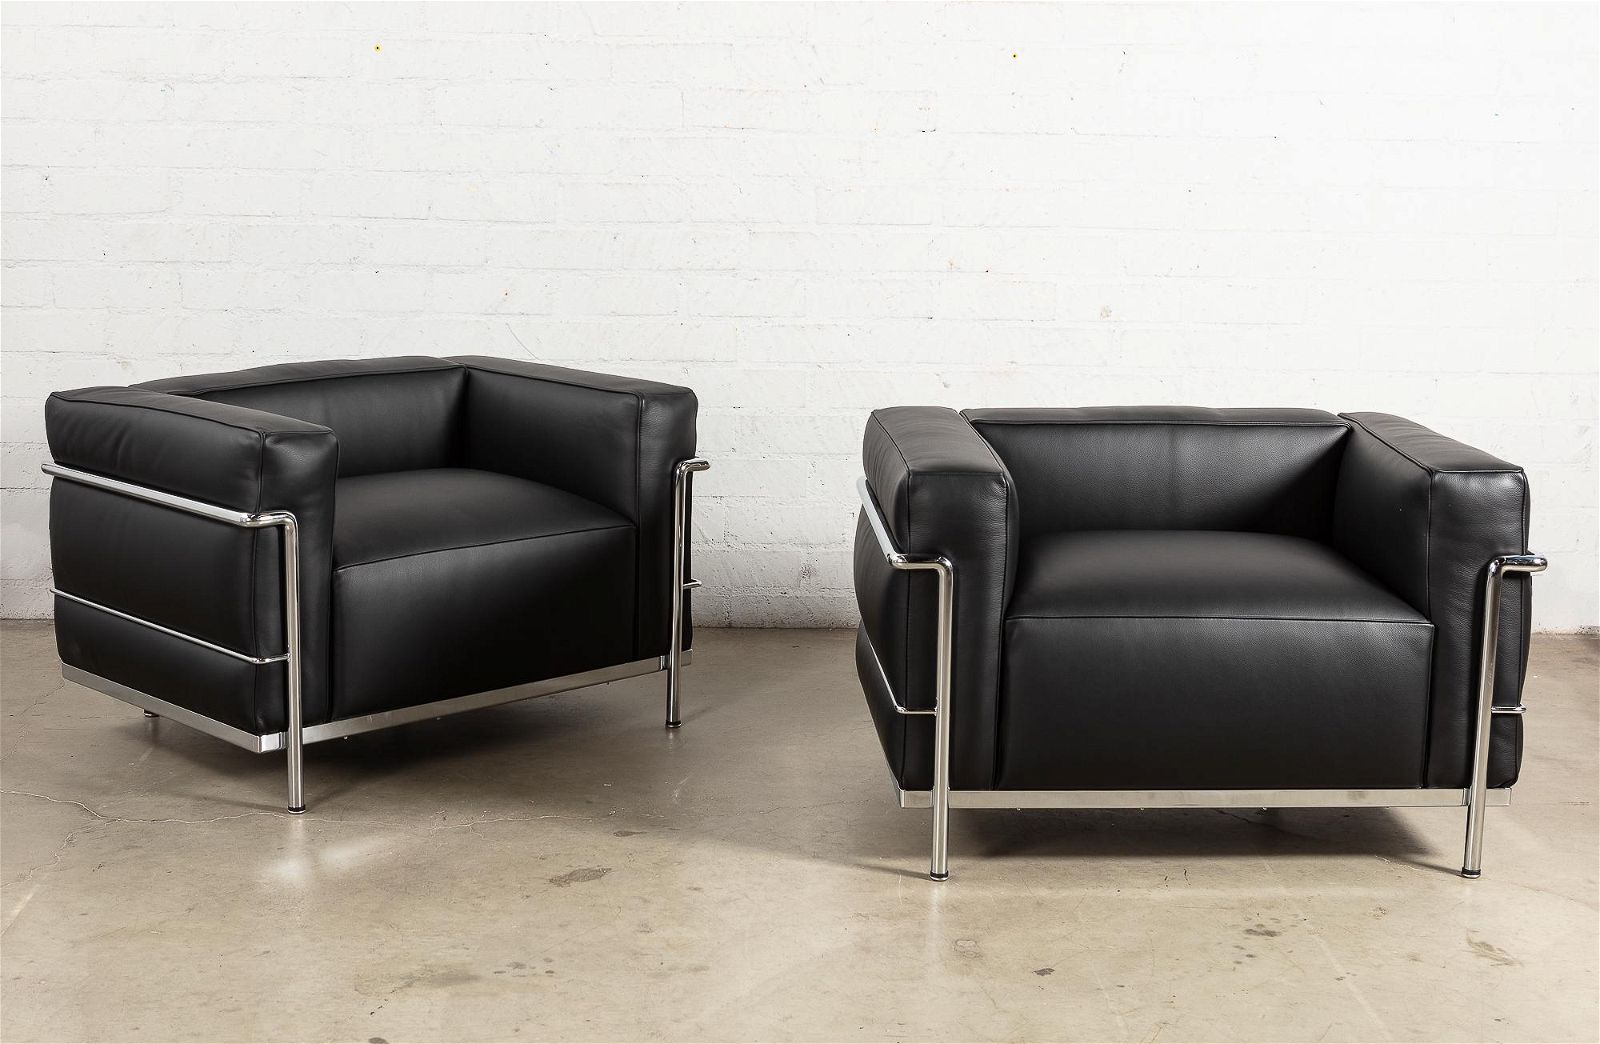 Pair of Italian chrome & leather club armchairs